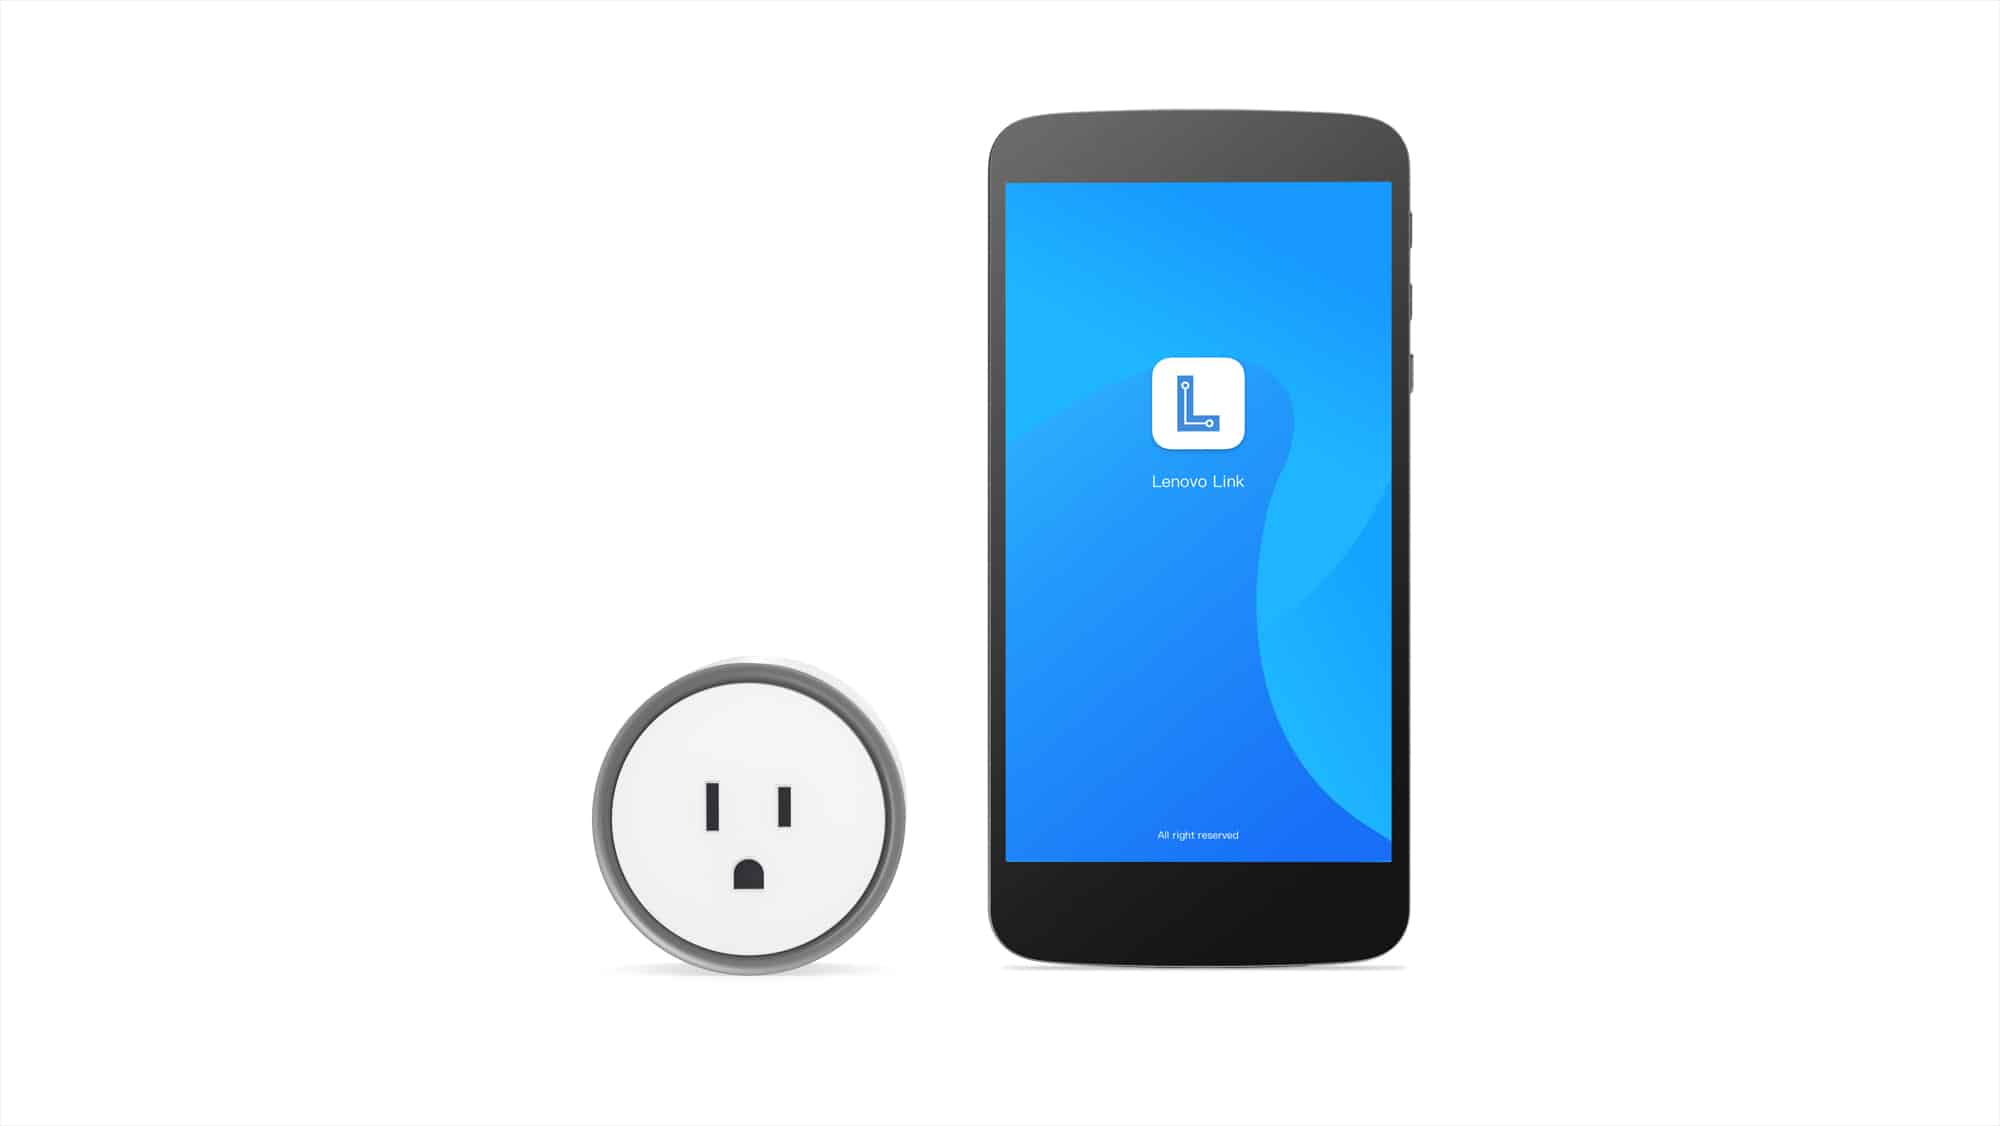 2 Smart Plug With Phone